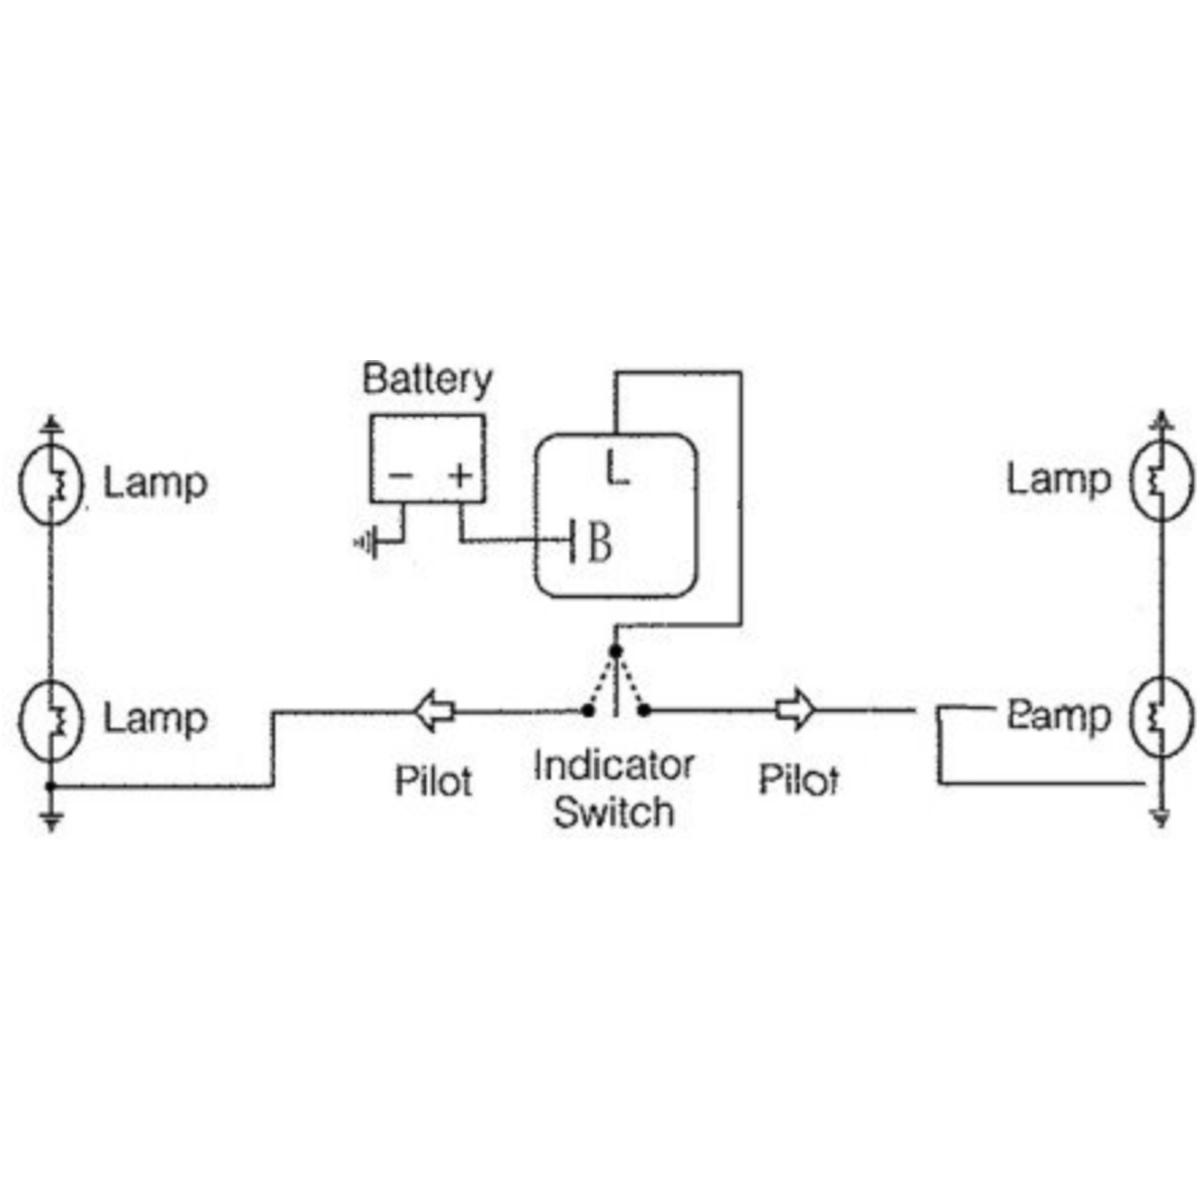 hight resolution of electronic flasher relay f r aprilia pegaso 650 ga 1992 48 27 ps 35